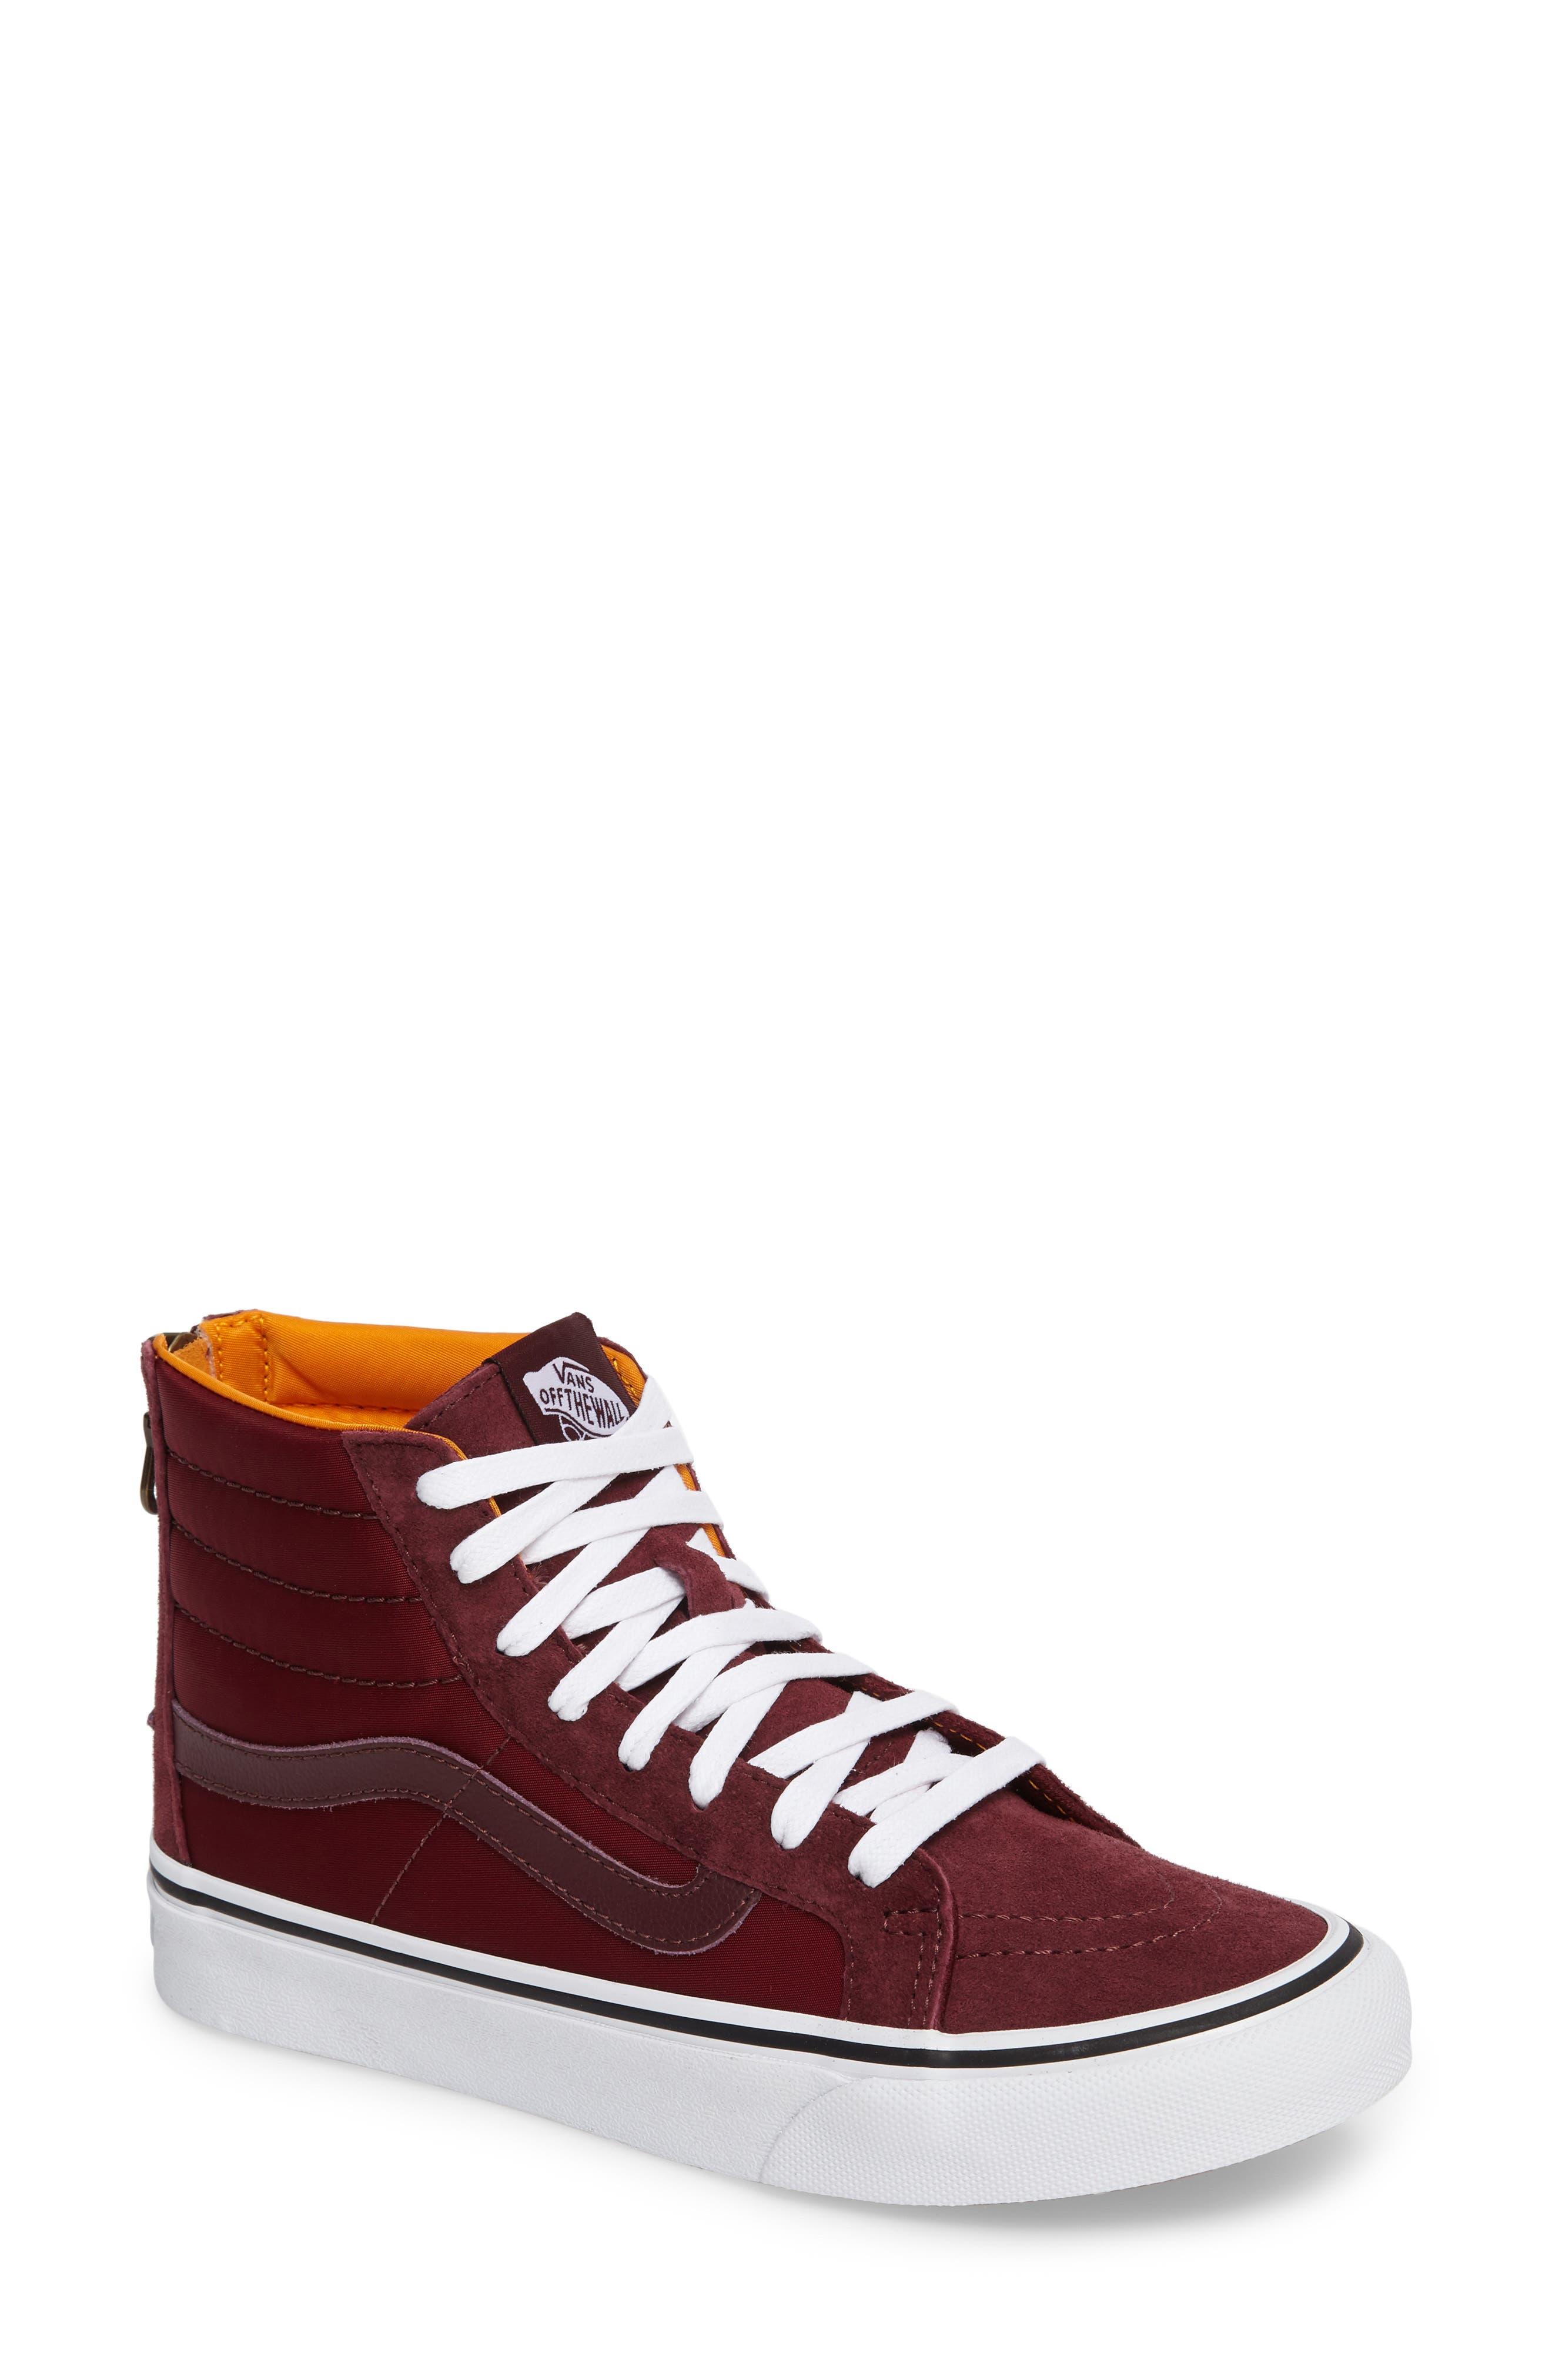 'Sk8-Hi' Slim Zip Sneaker,                         Main,                         color, Port Royale/ True White